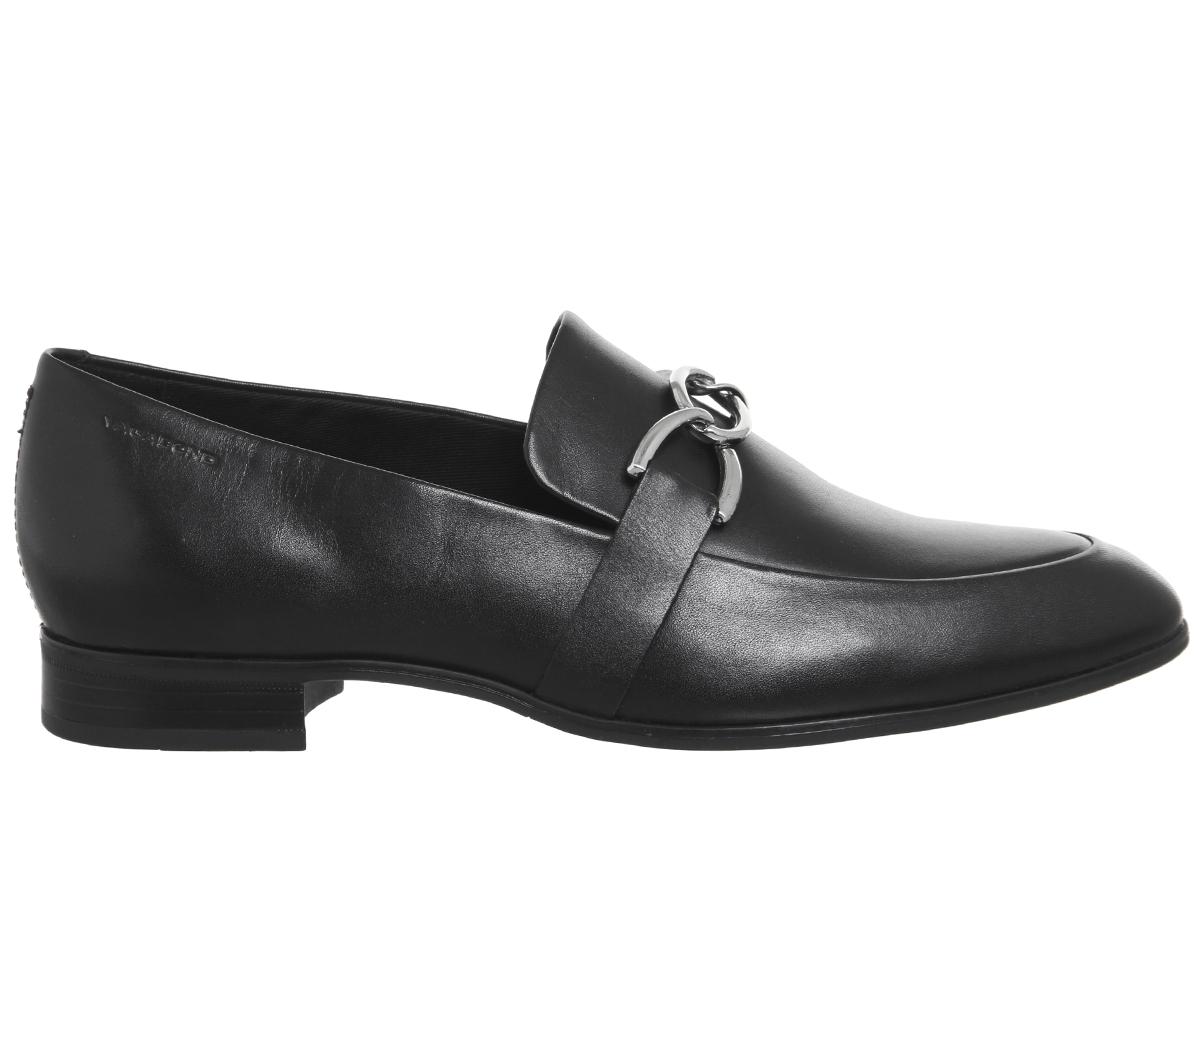 Damenschuhe Vagabond Vagabond Damenschuhe Frances Detail Loafers BLACK LEATHER Flats 26bada